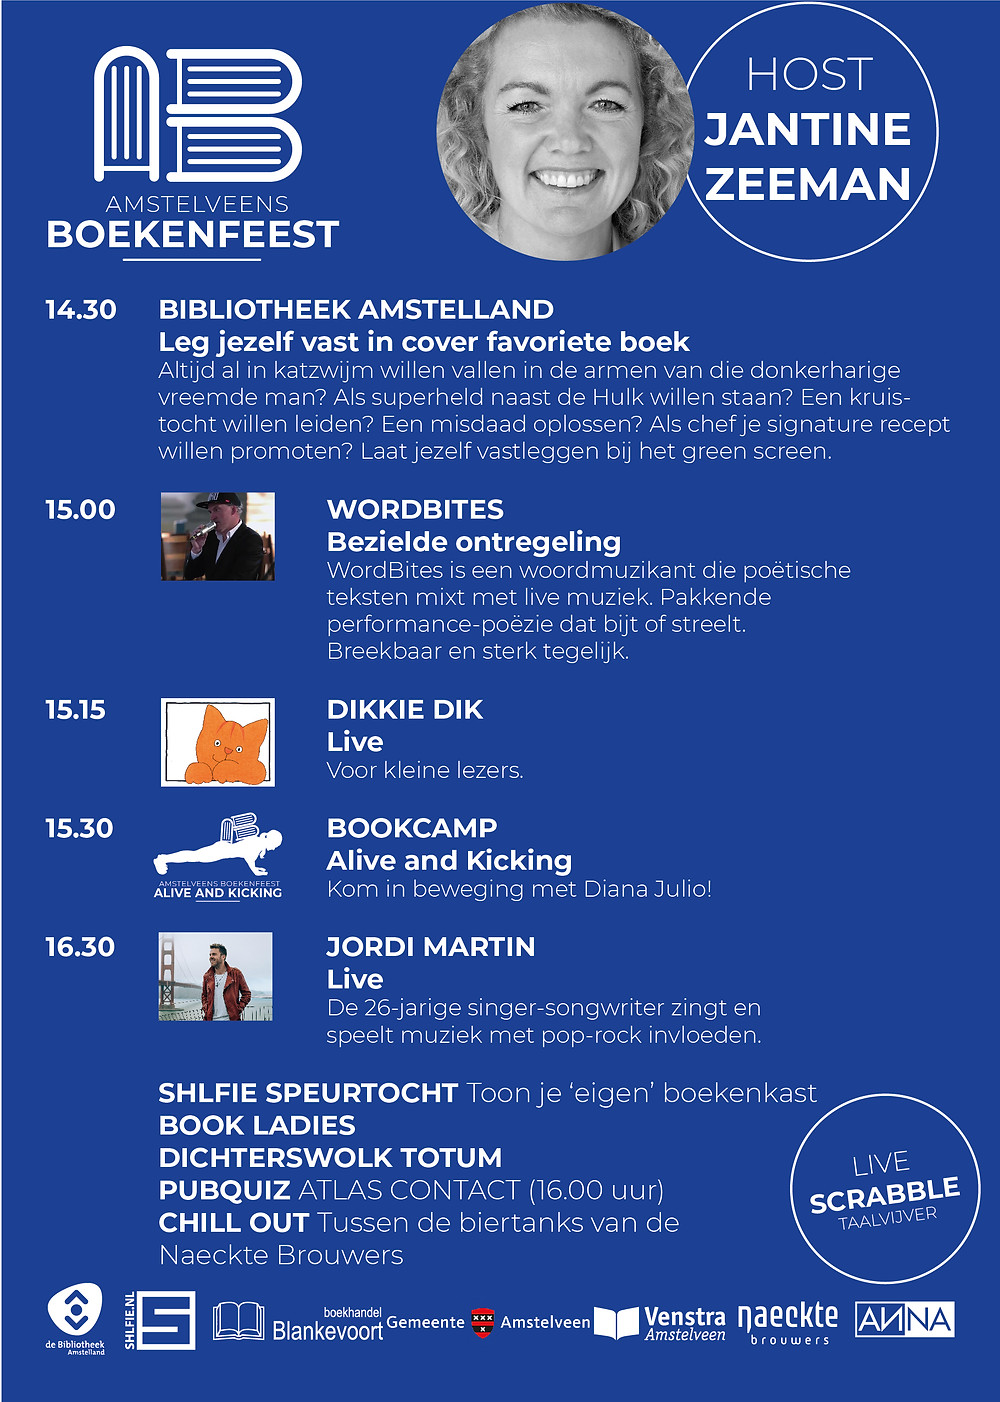 Cultureel evenement in Annakerk